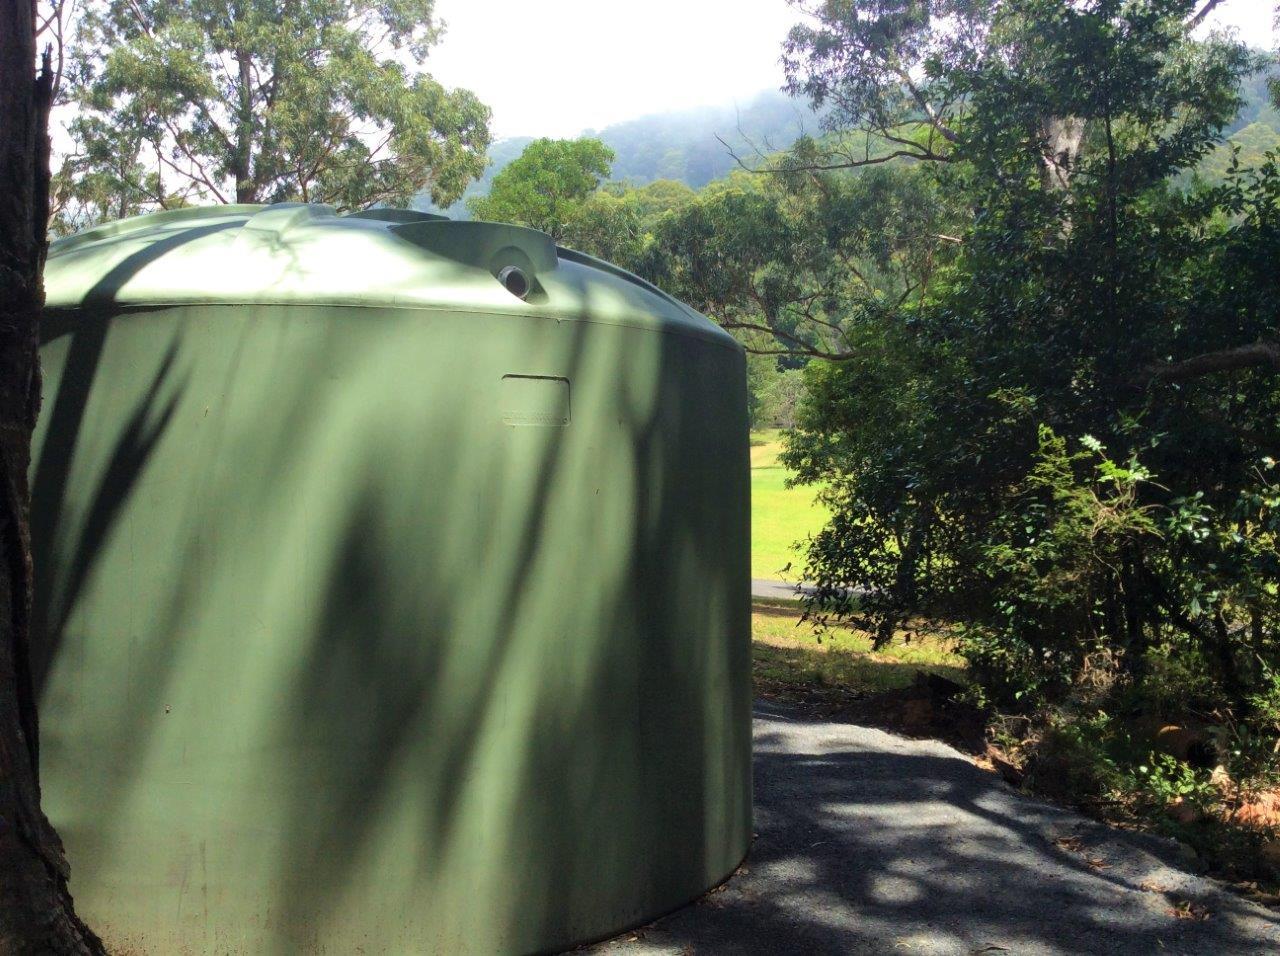 22700l Rainwater Tank Rotoplas Rainwater Tanks